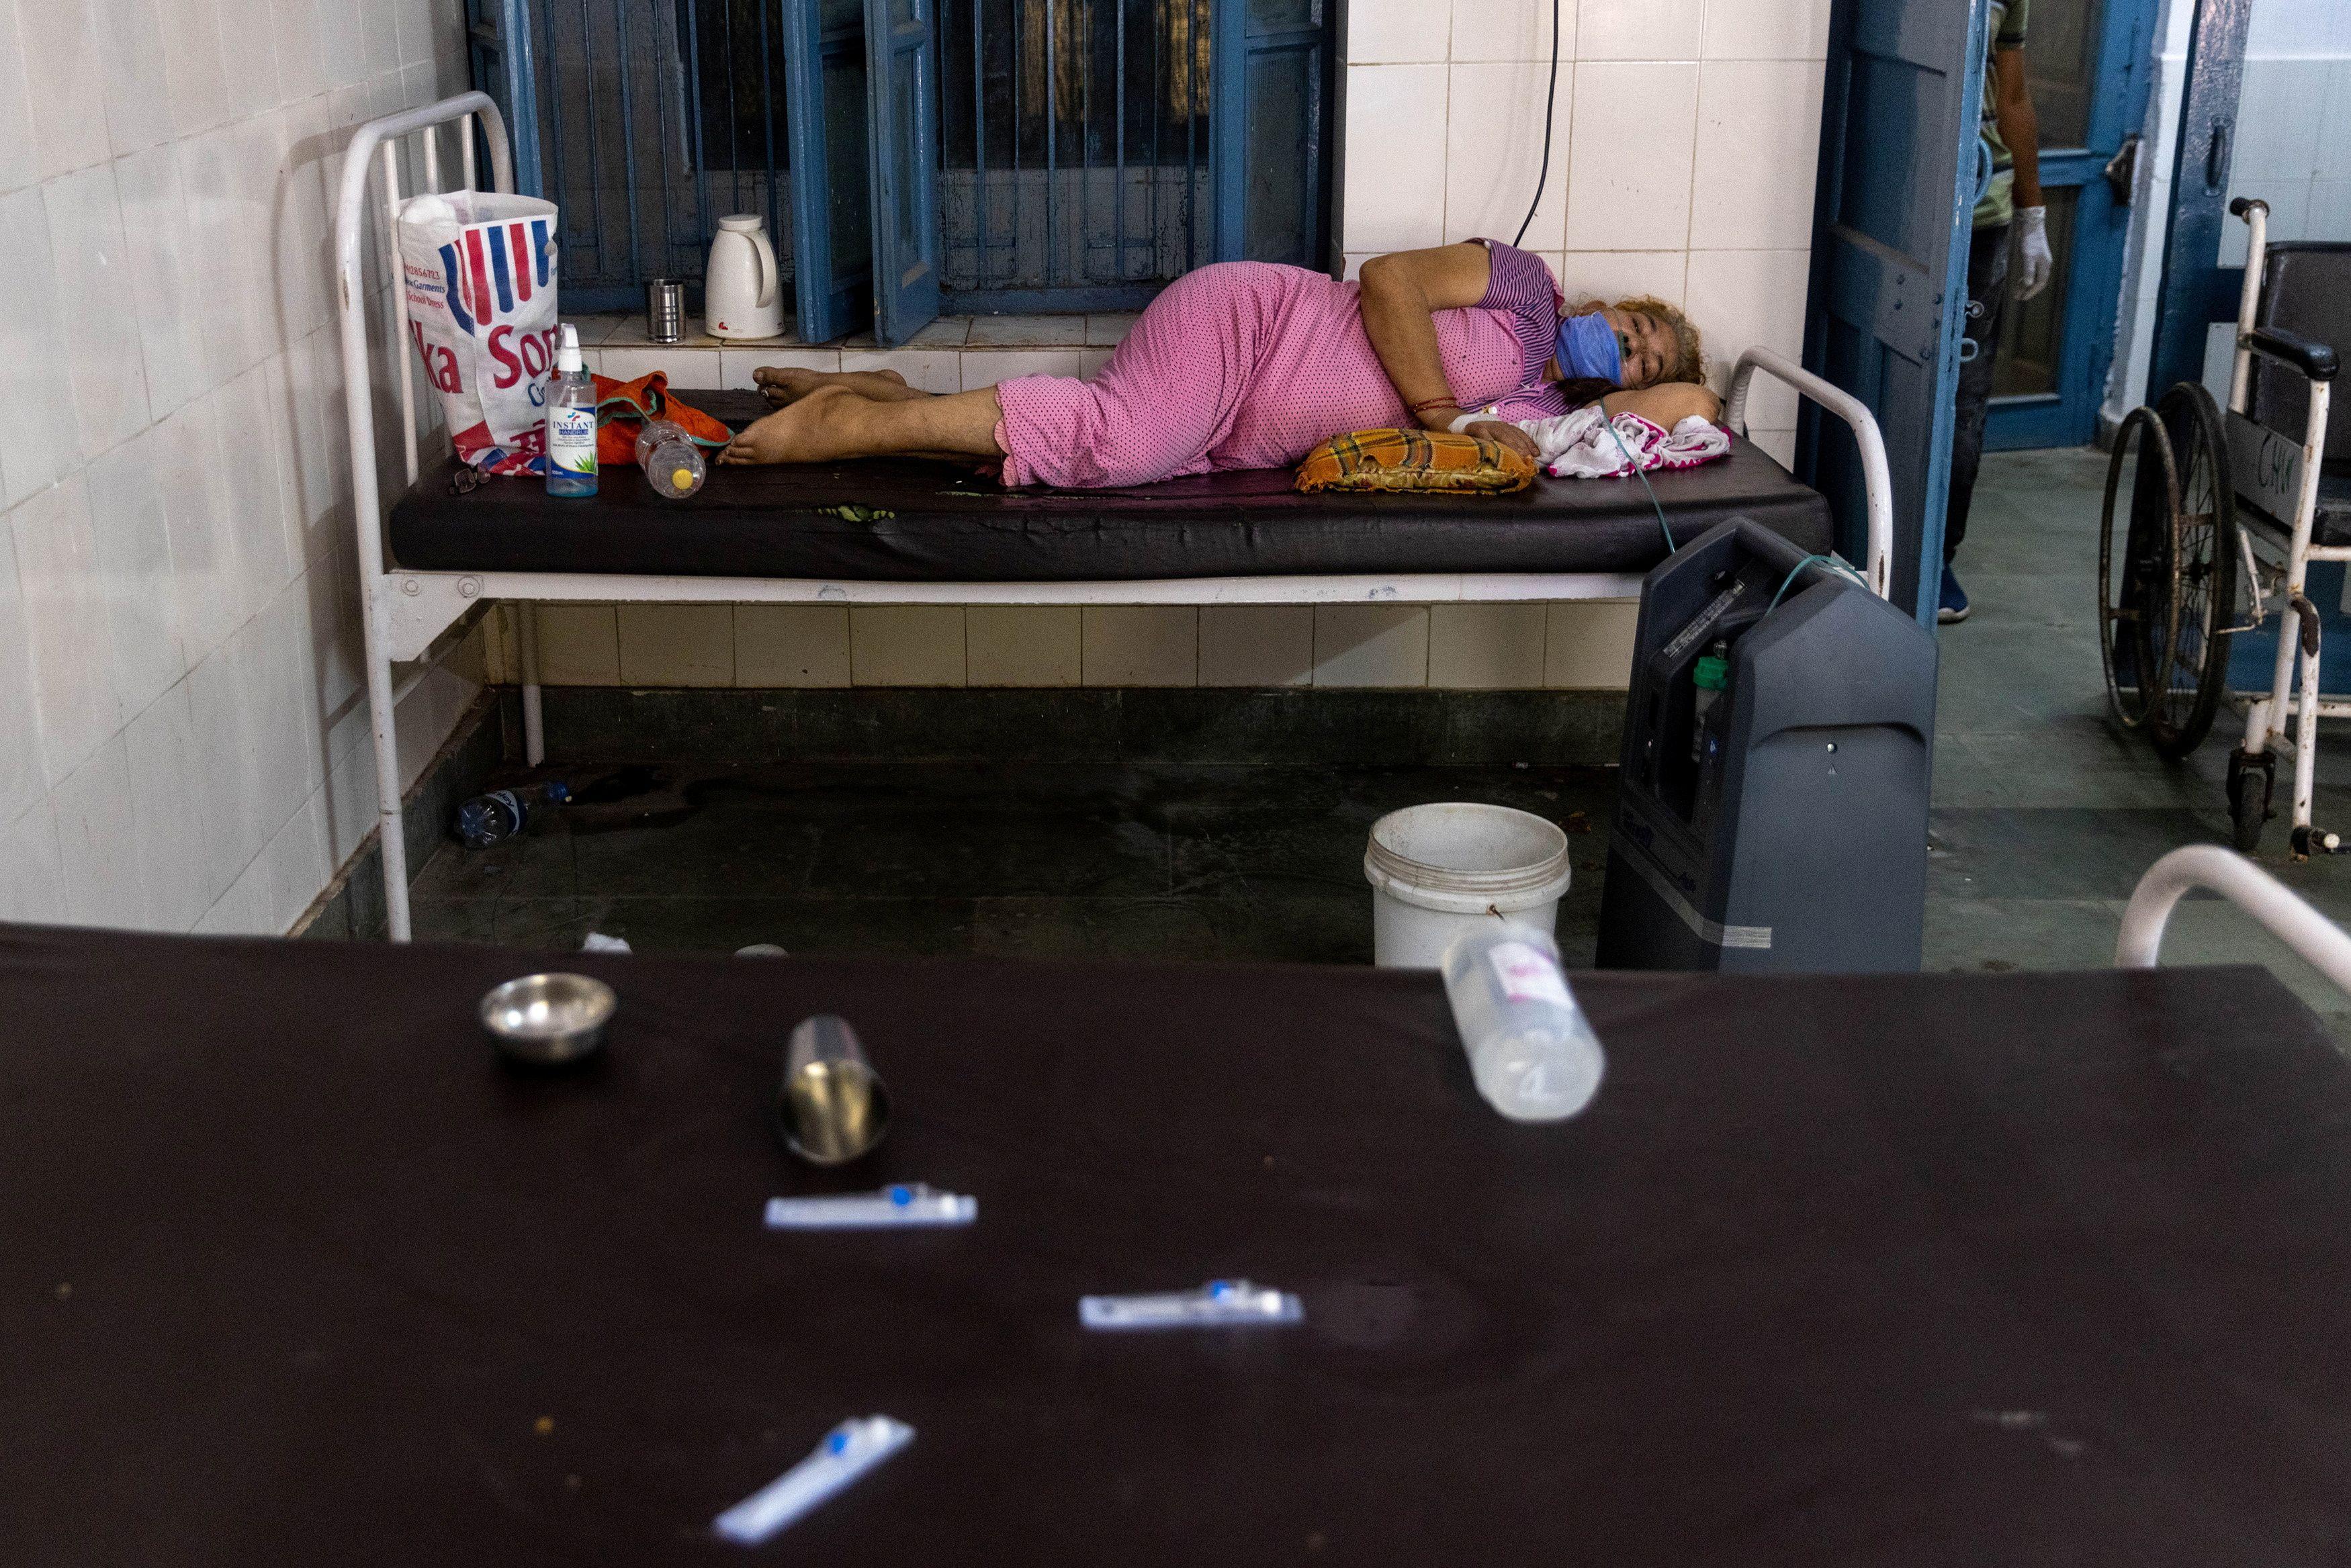 A woman receives treatment inside a COVID-19 ward of a government-run hospital, amidst the coronavirus disease (COVID-19) pandemic, in Bijnor district, Uttar Pradesh, India, May 11, 2021. REUTERS/Danish Siddiqui